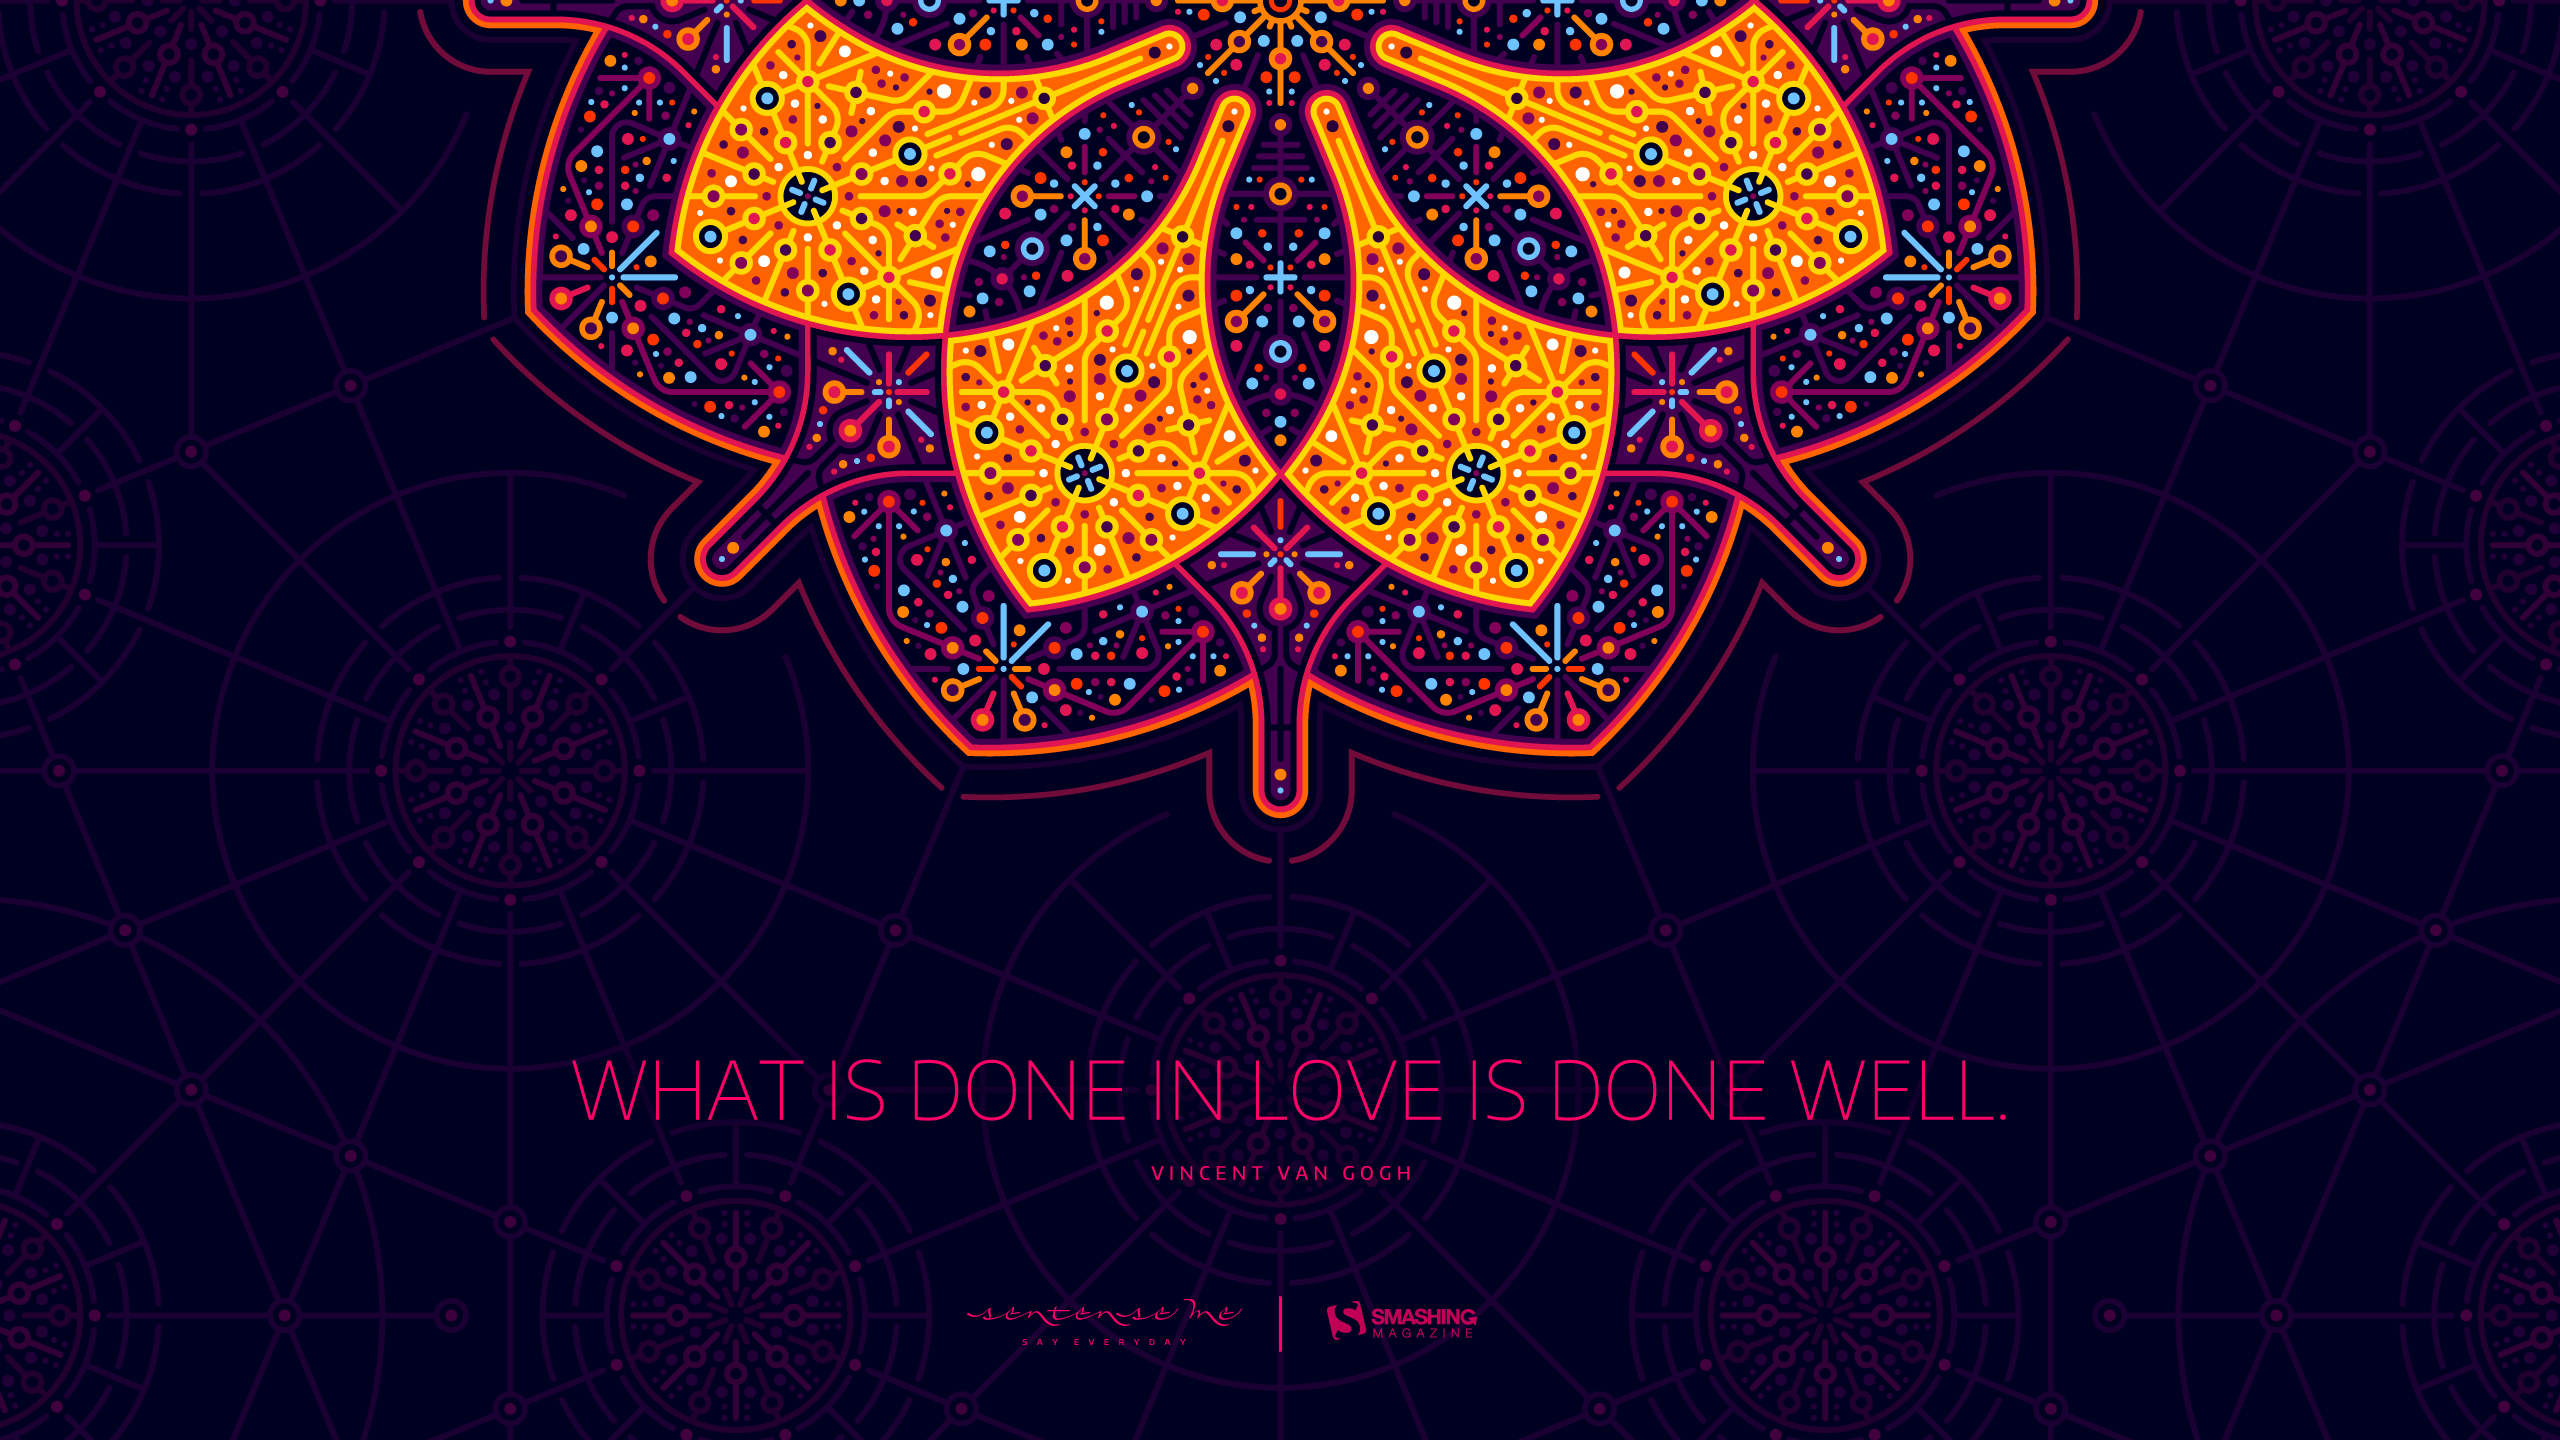 Inspirational Quotes 1920x1080 Wallpaper Quotes - HD Wallpaper